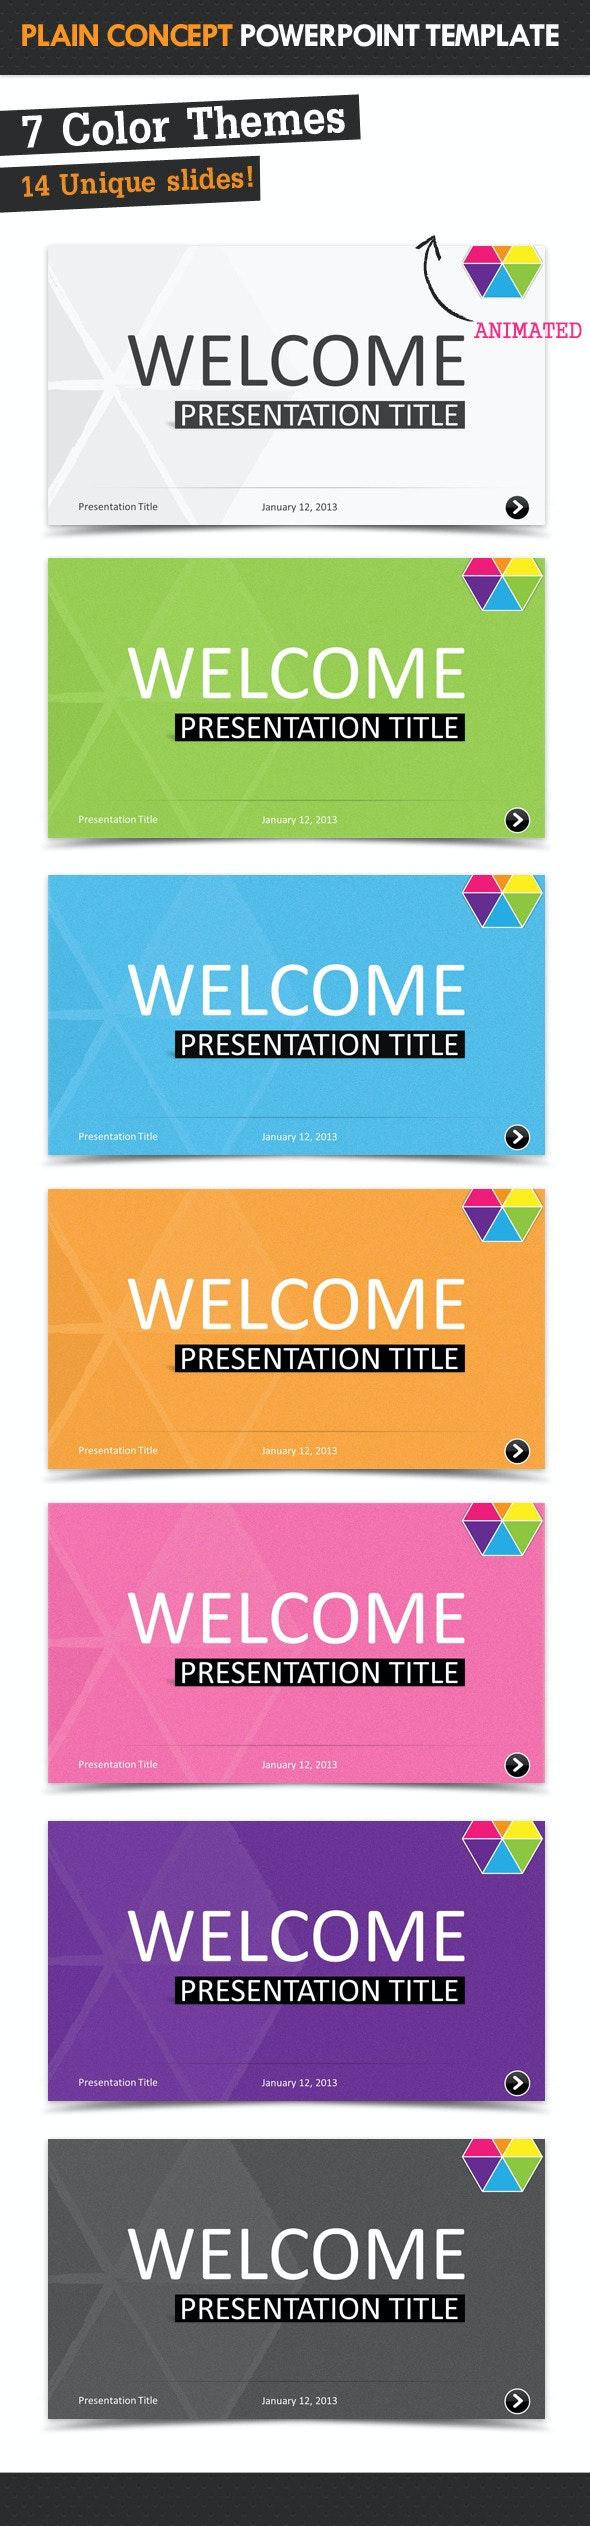 Plain Concept Powerpoint Template - PowerPoint Templates Presentation Templates